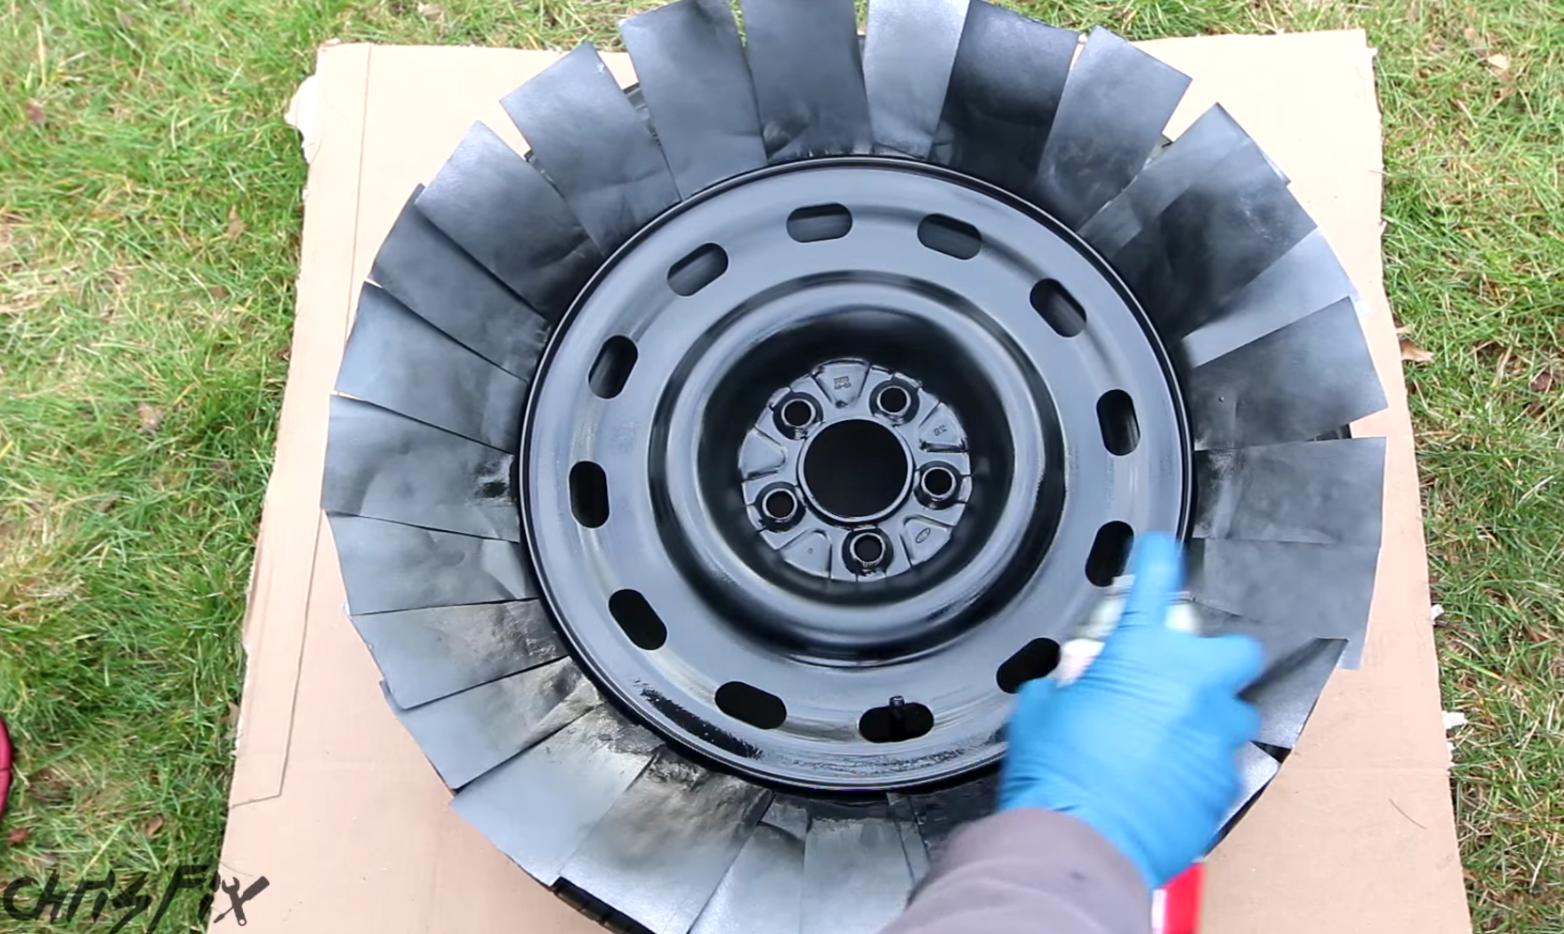 How To Paint Car Wheels — DIY Car Wheel Painting